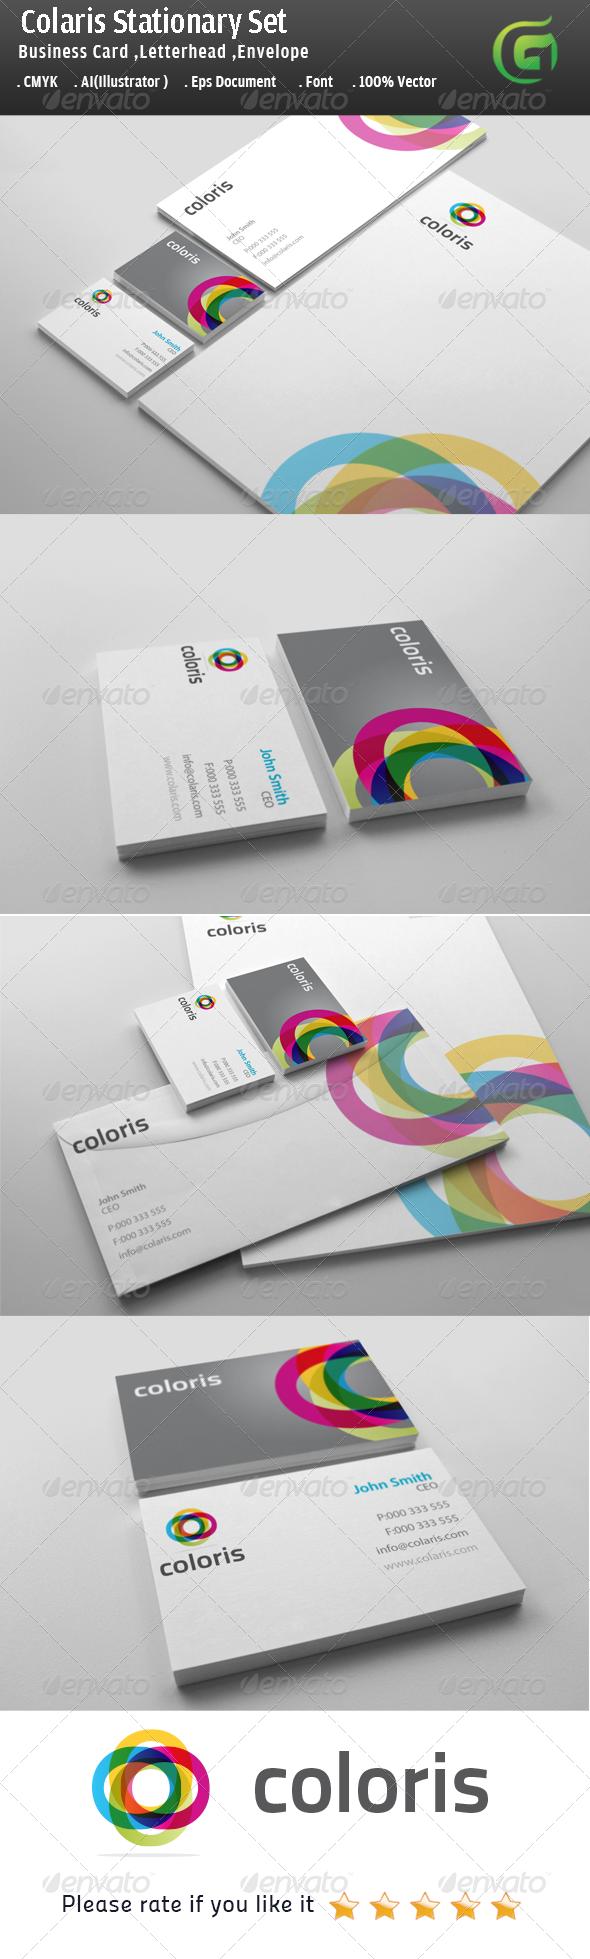 Colaris Stationary Design - Corporate Business Cards